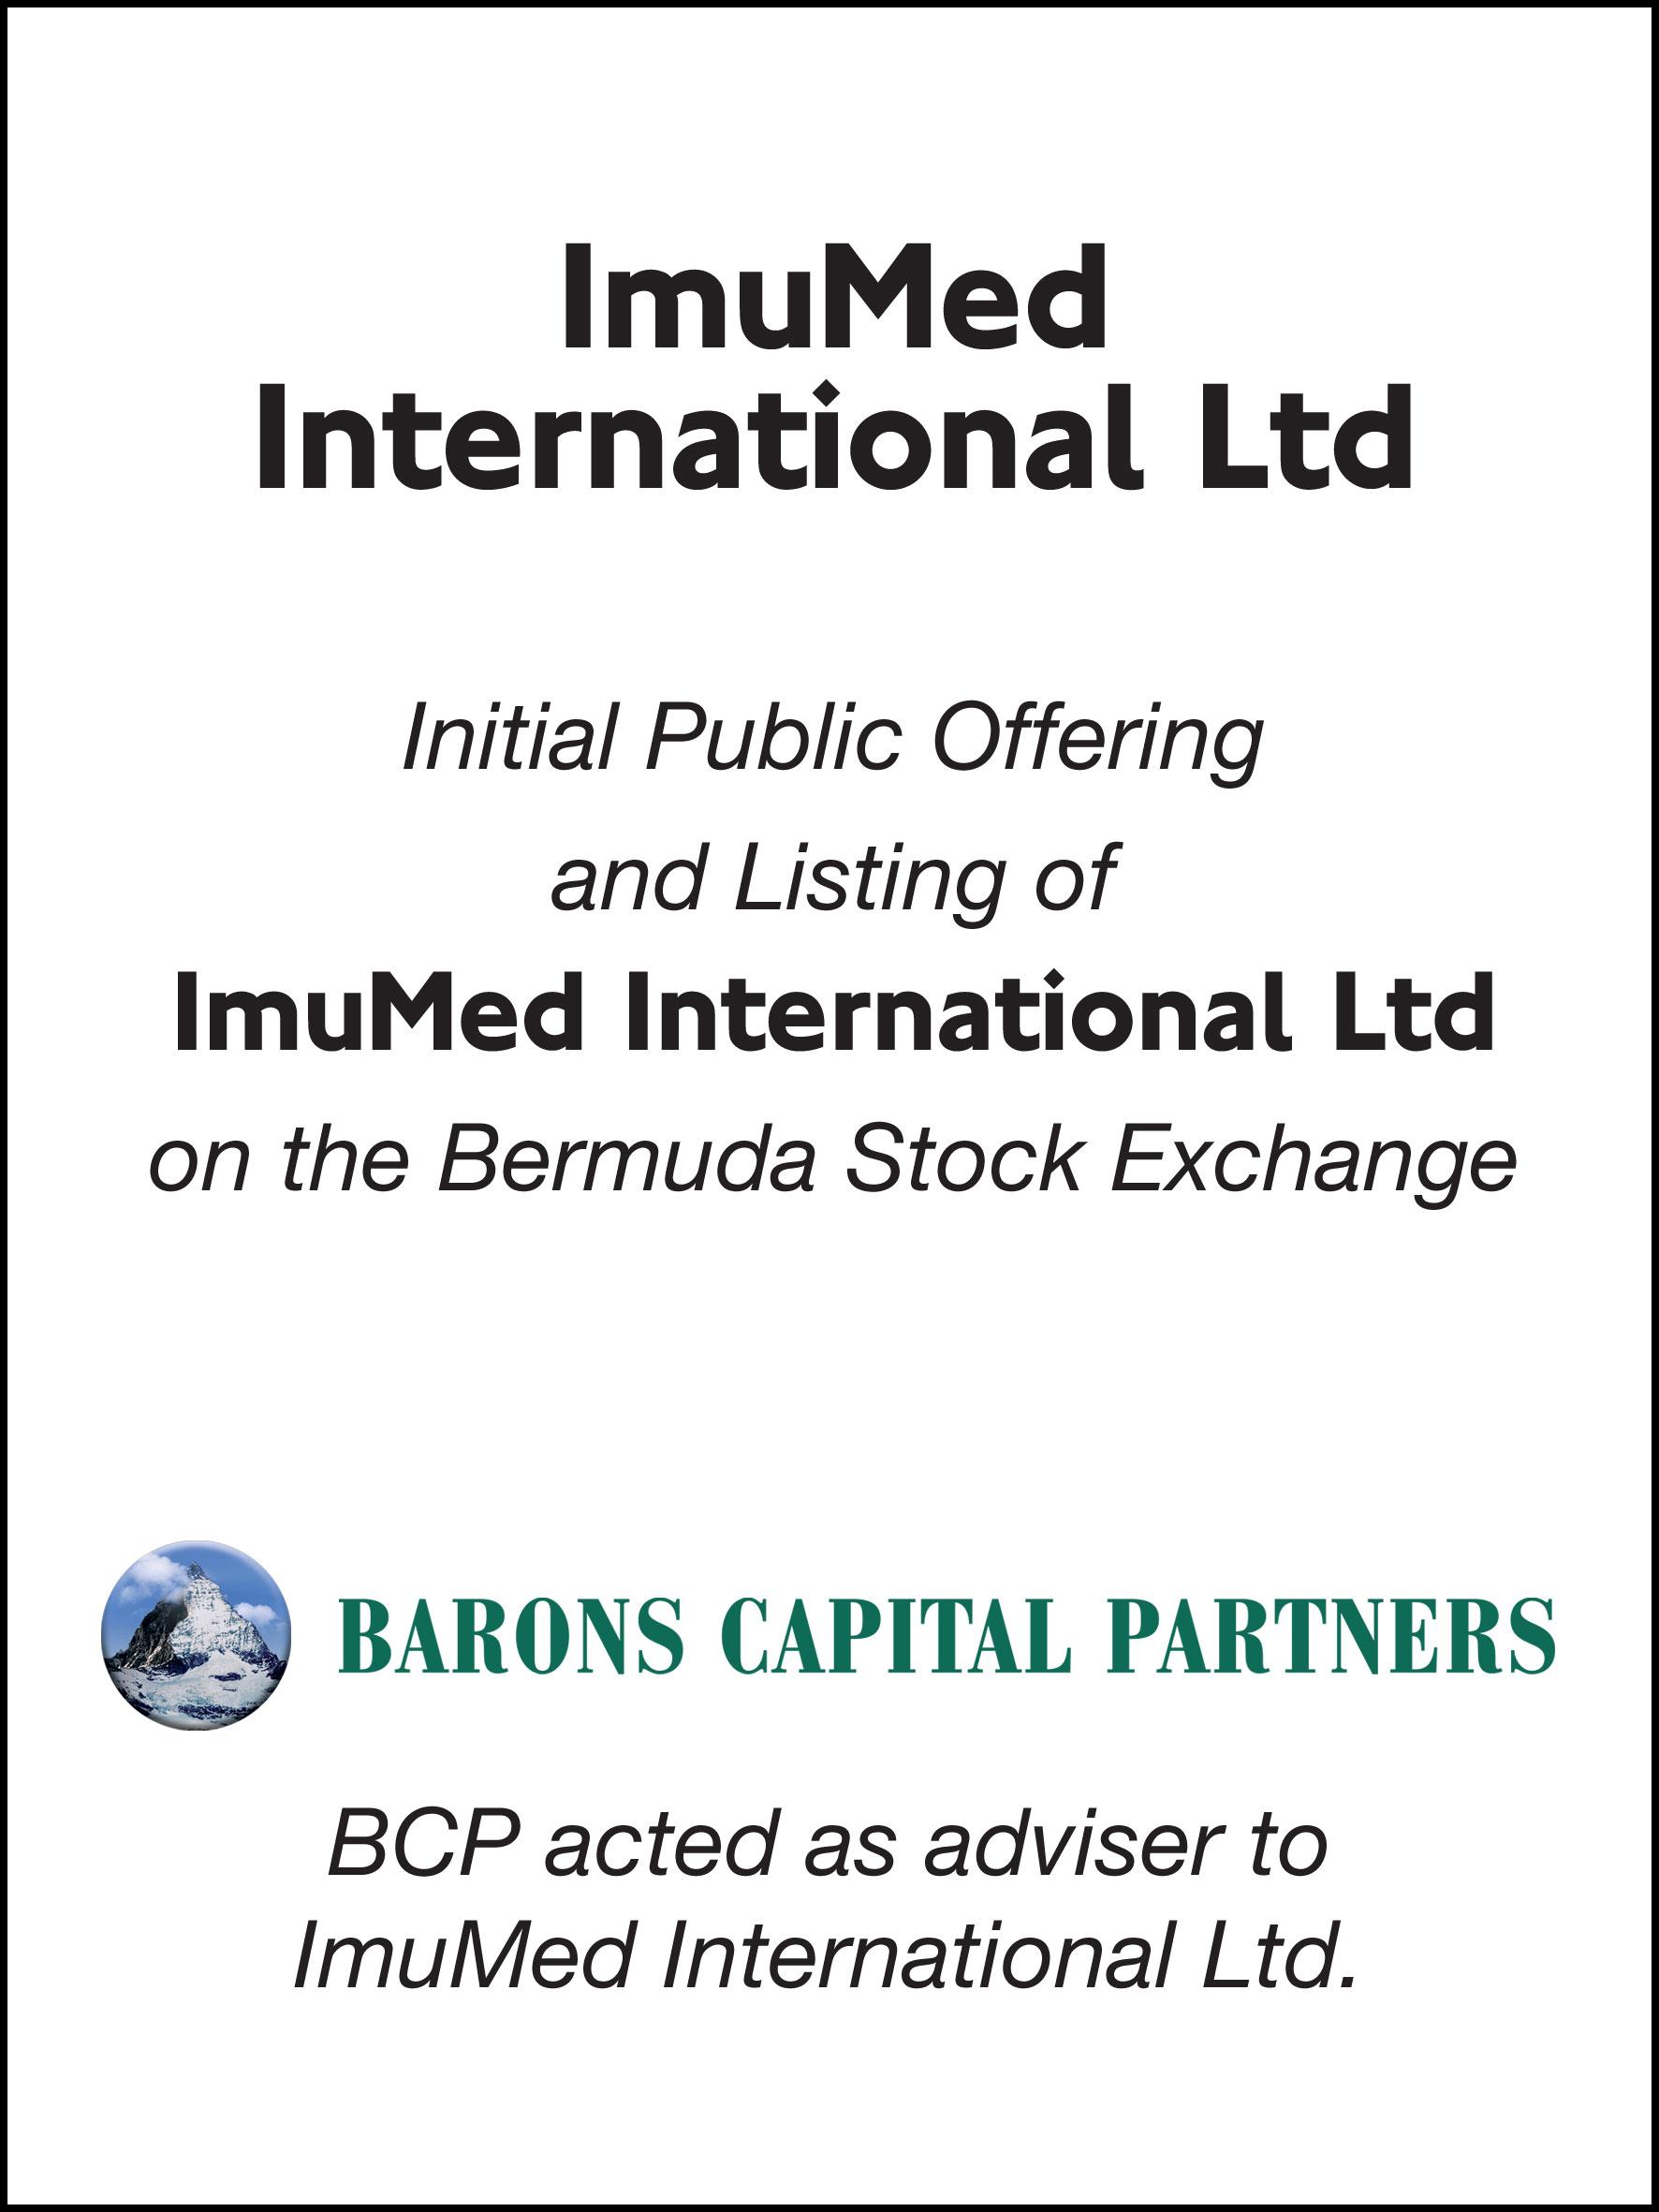 41_ImuMed International Ltd